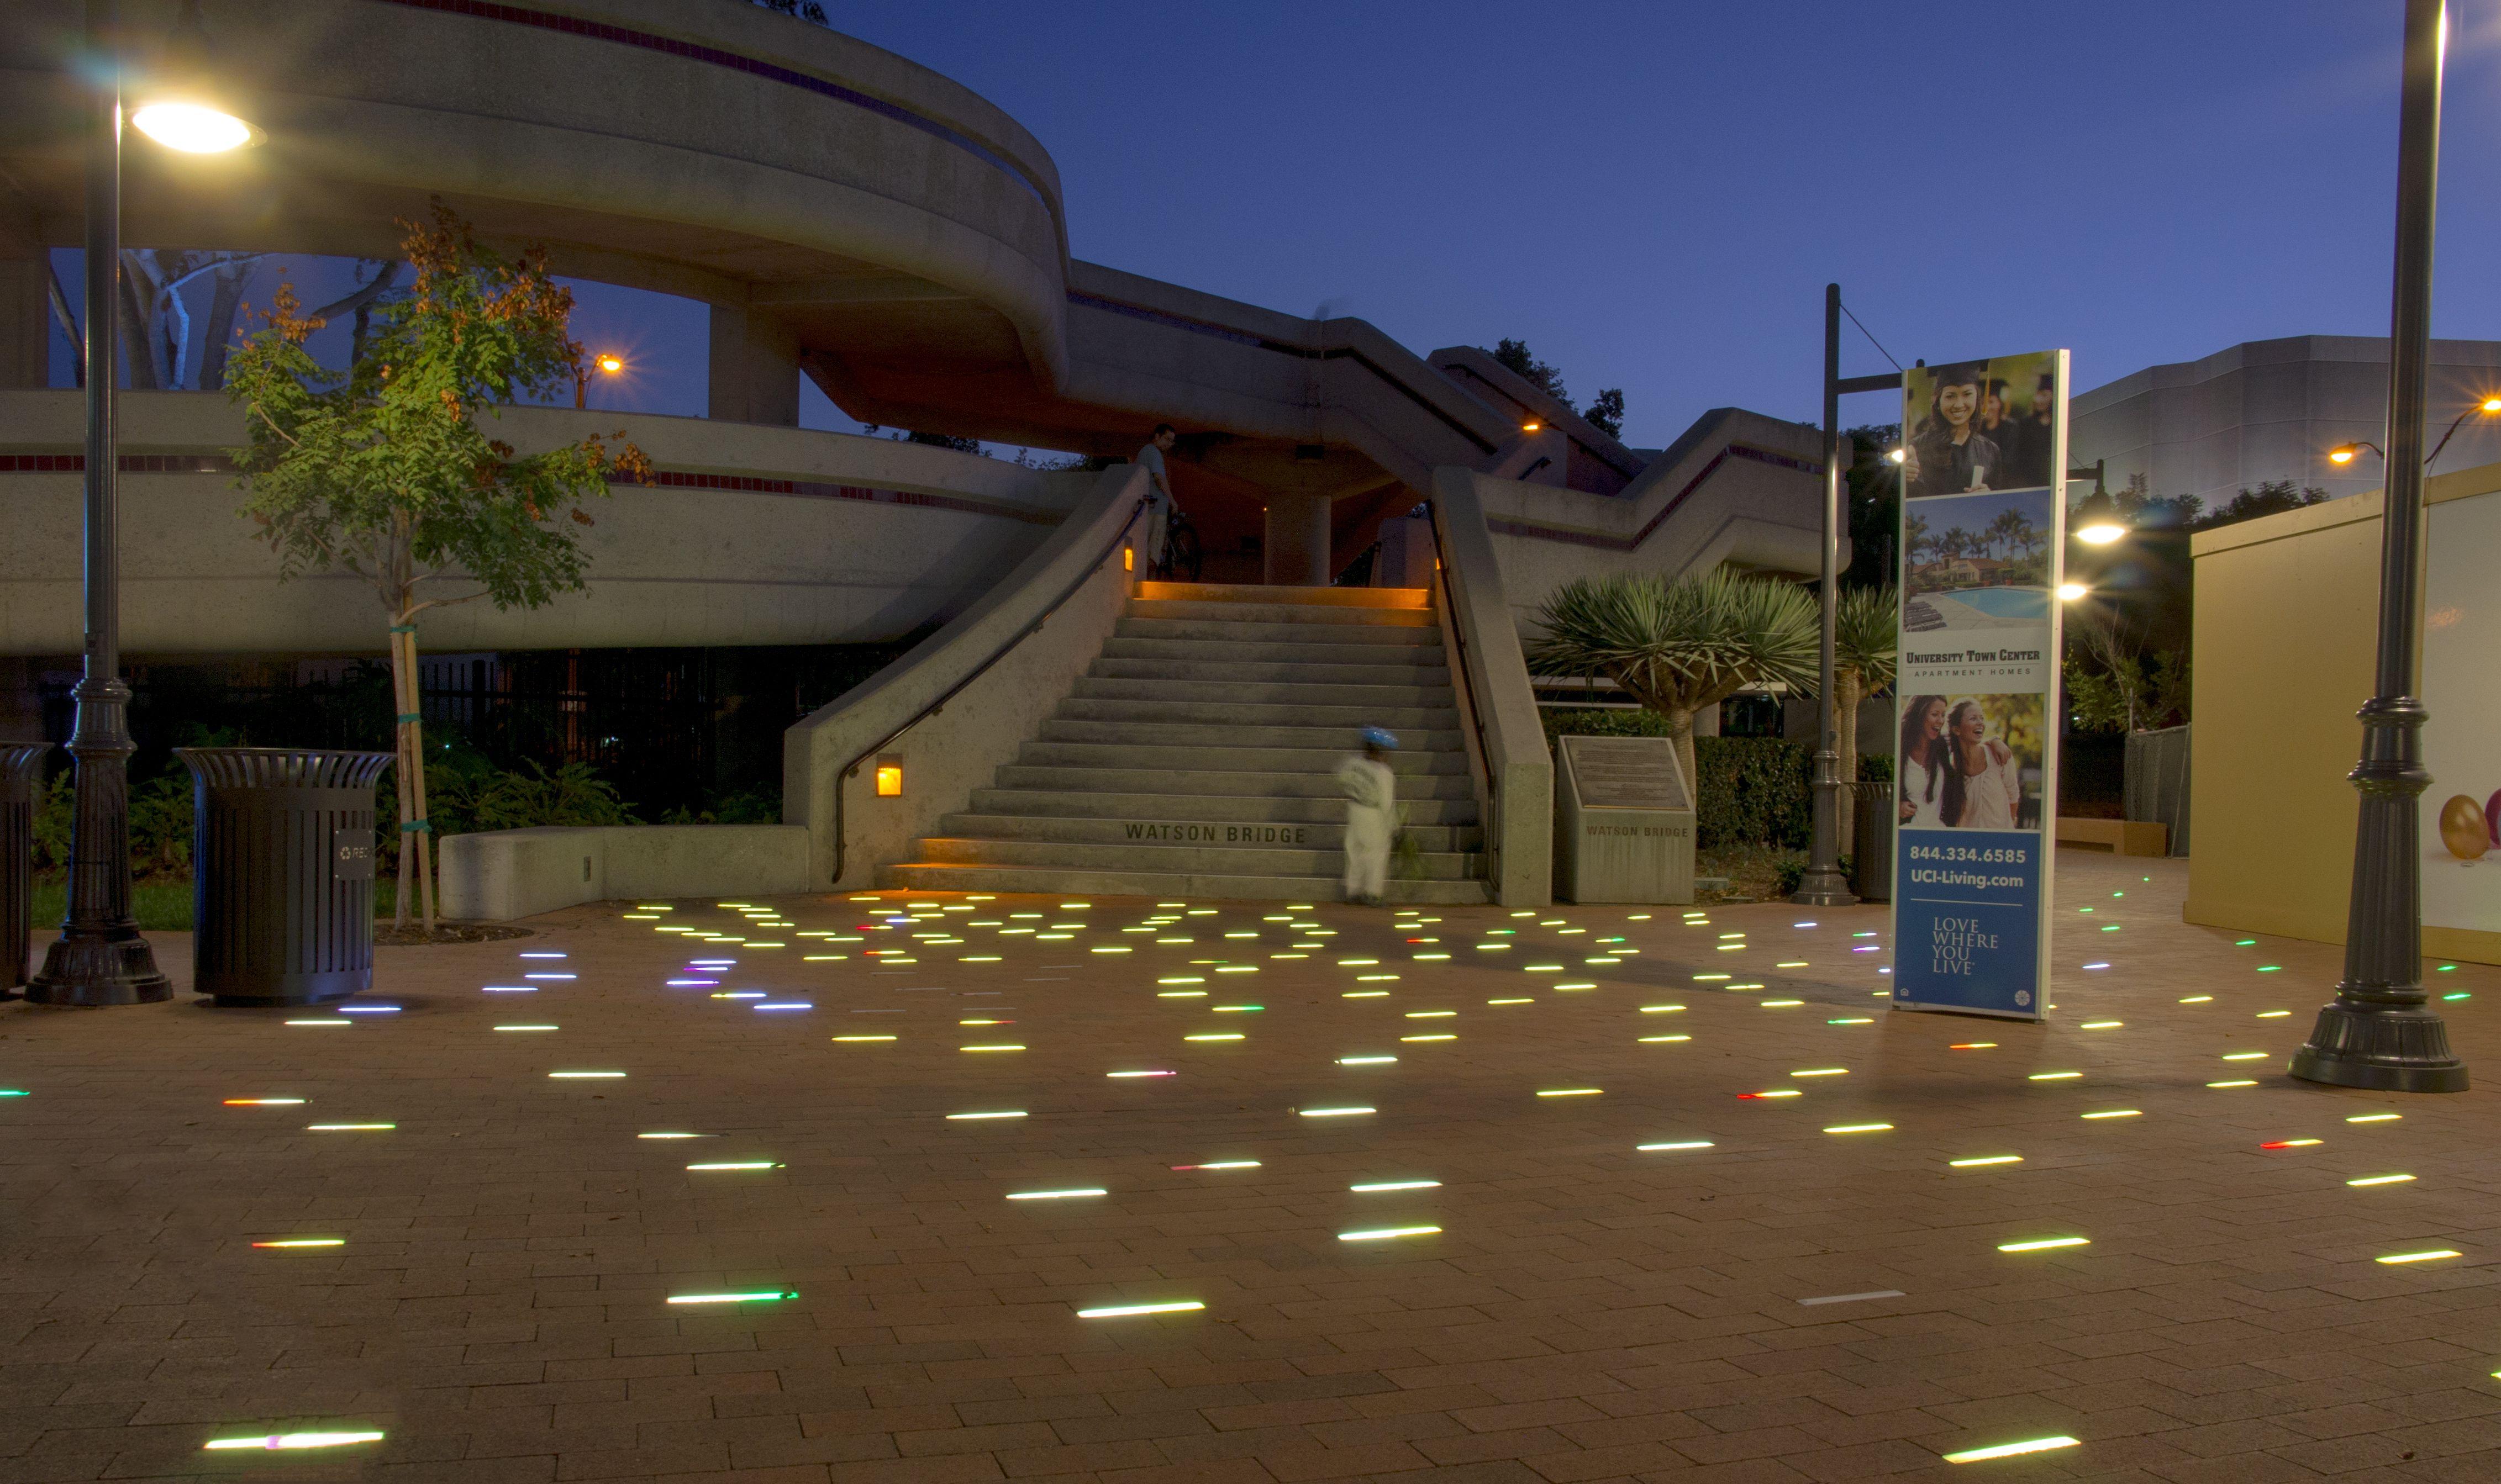 University Center Interactive Led Lighting Pavement By